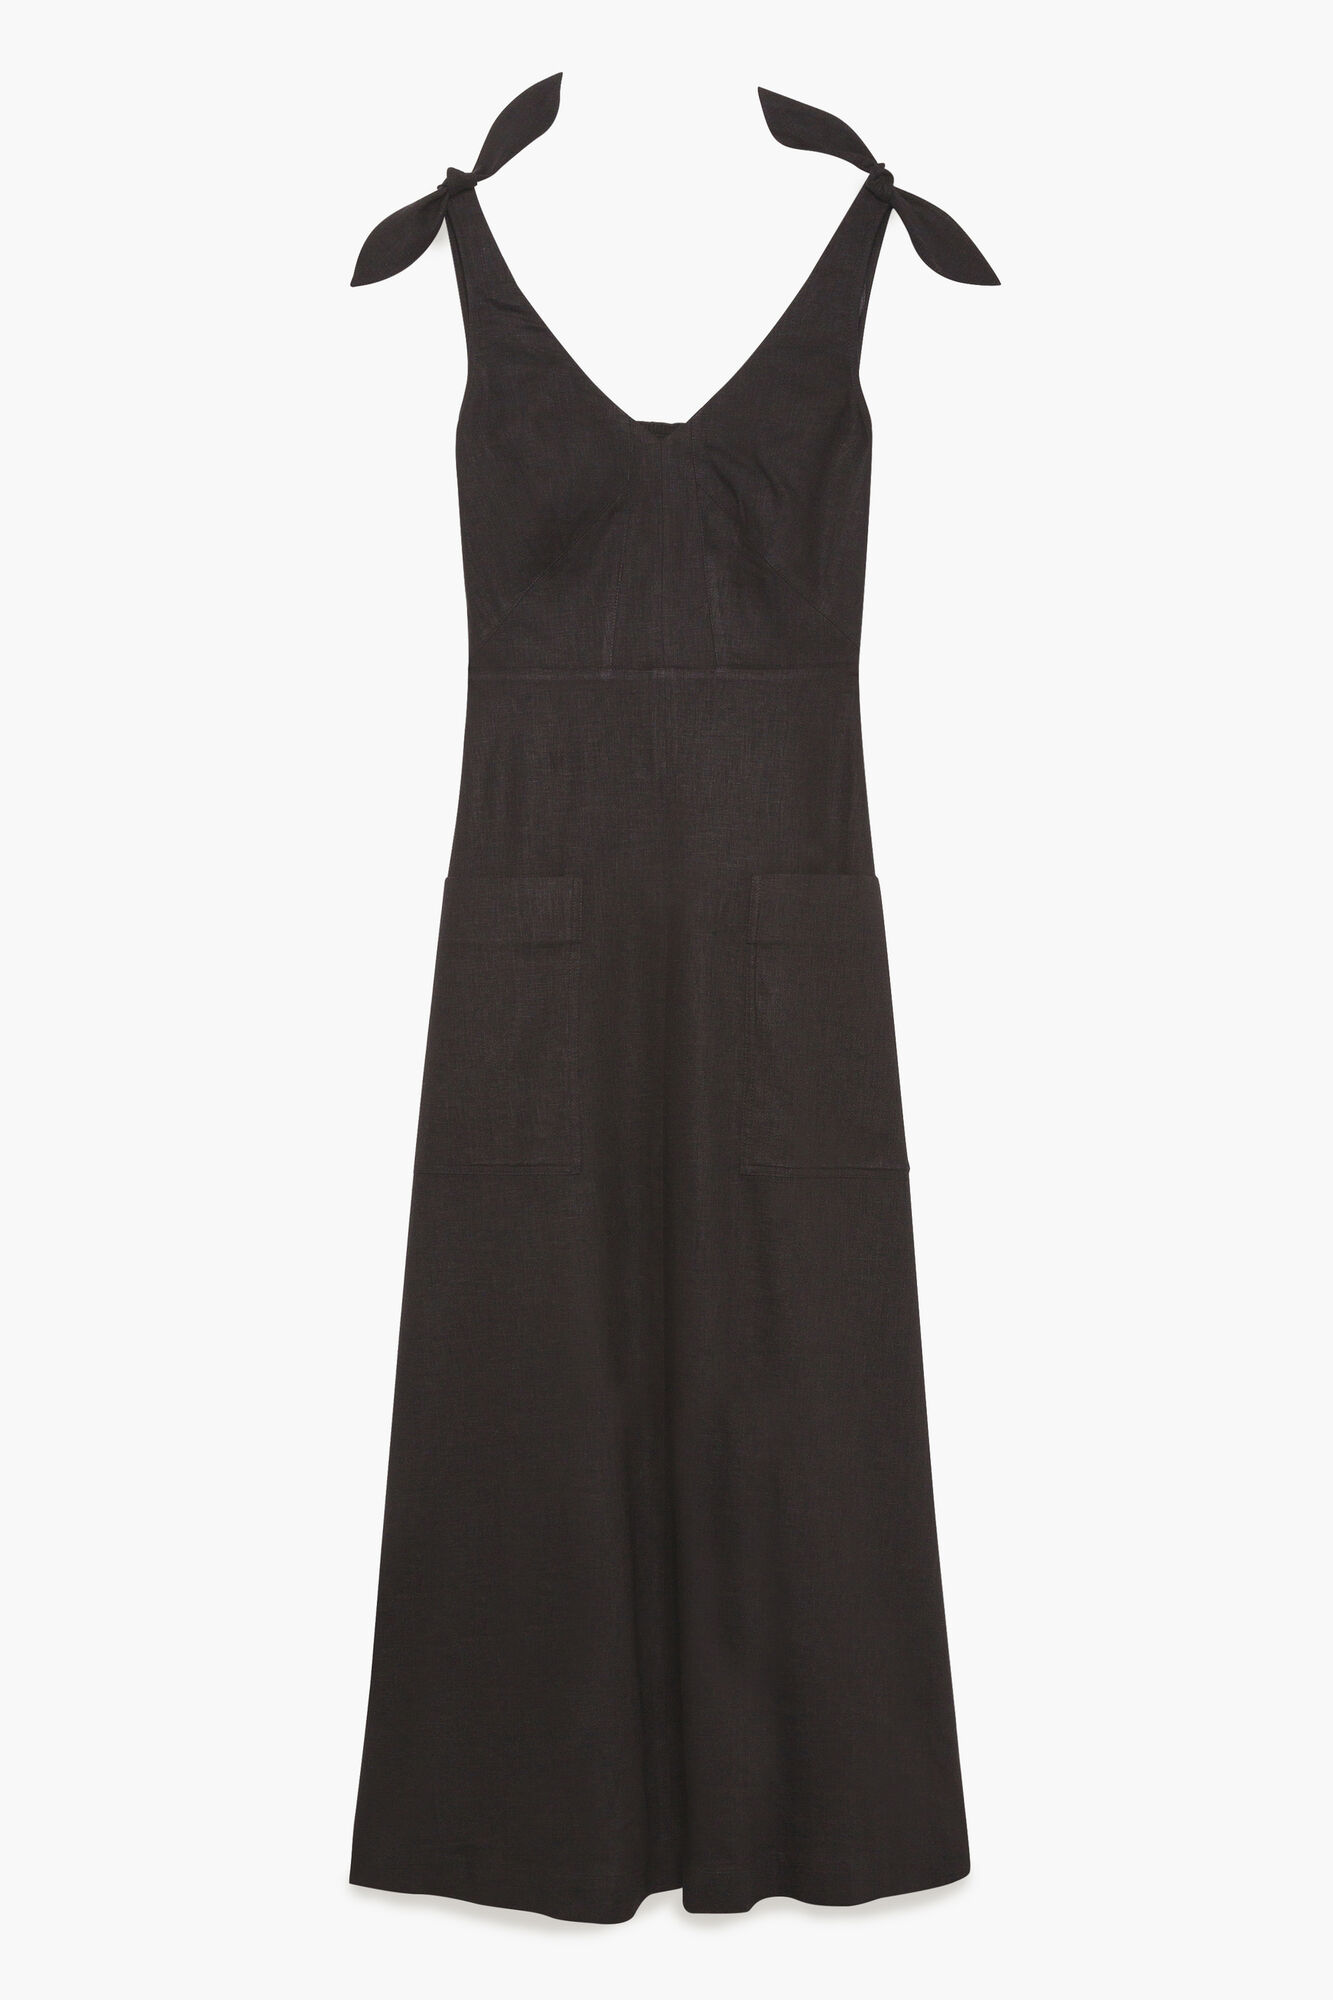 25b7e233b49 Robe Kylie   Robe femme Noir en à 120.00 €